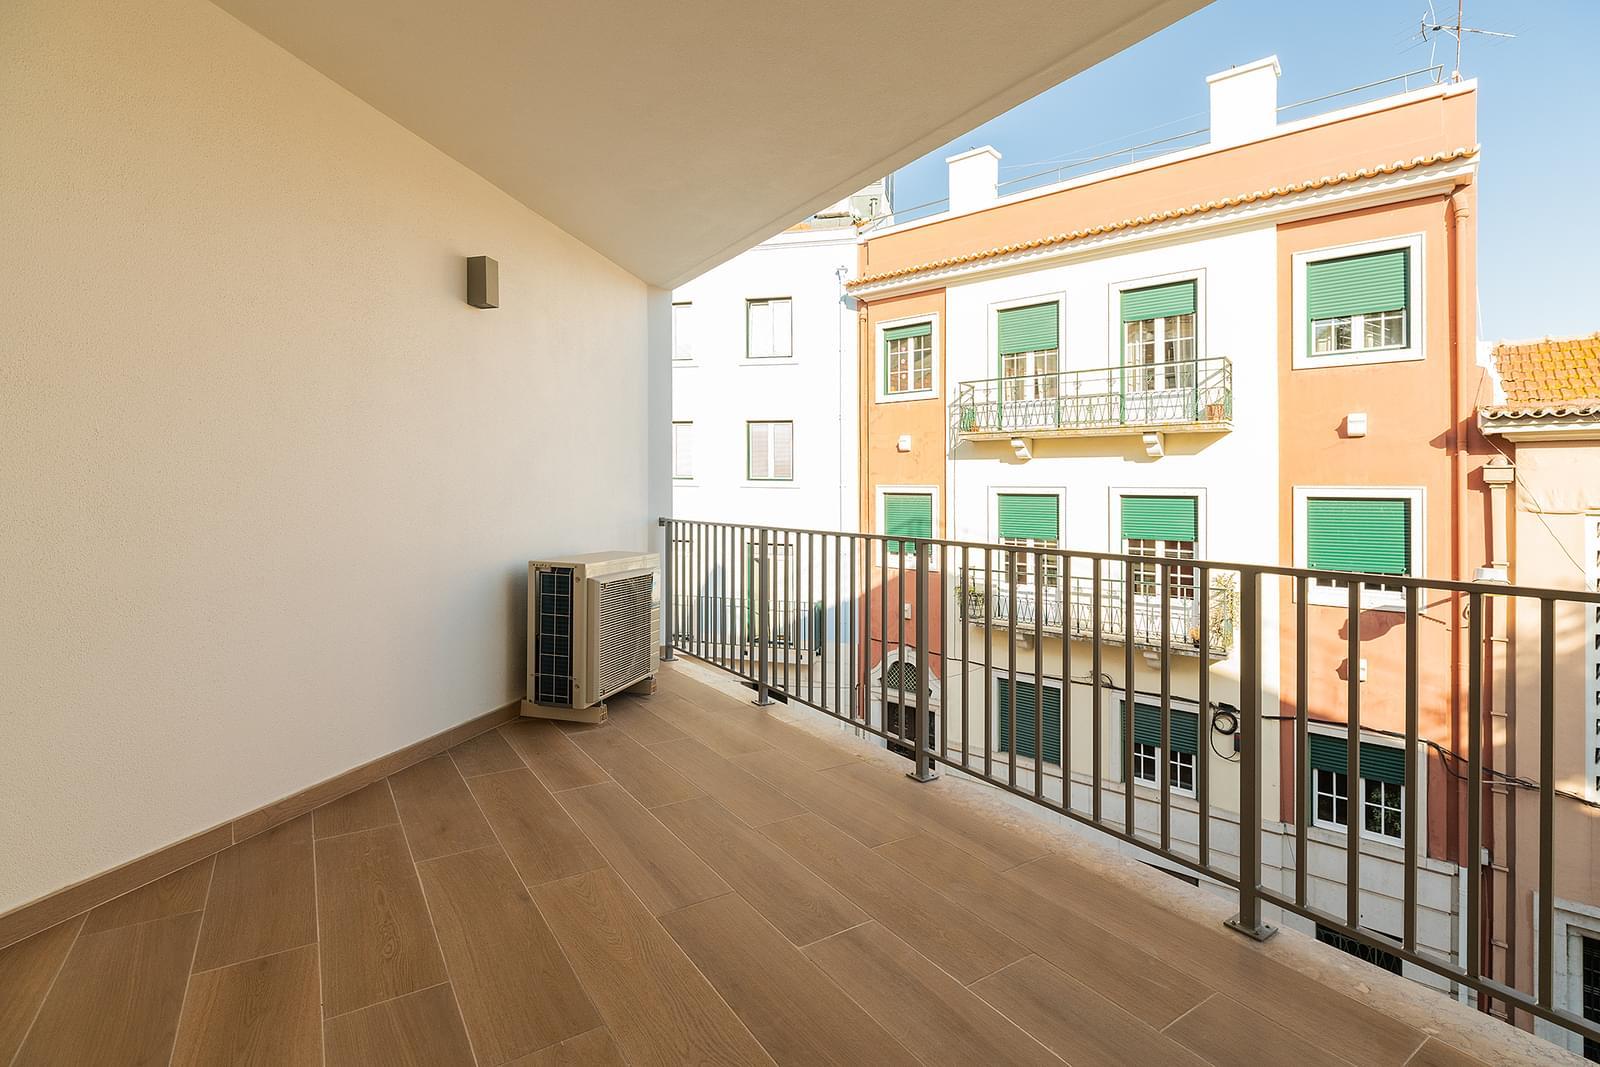 pf16829-apartamento-t1-lisboa-4ba6cbaa-3704-4f8f-b79d-0f275c977db0